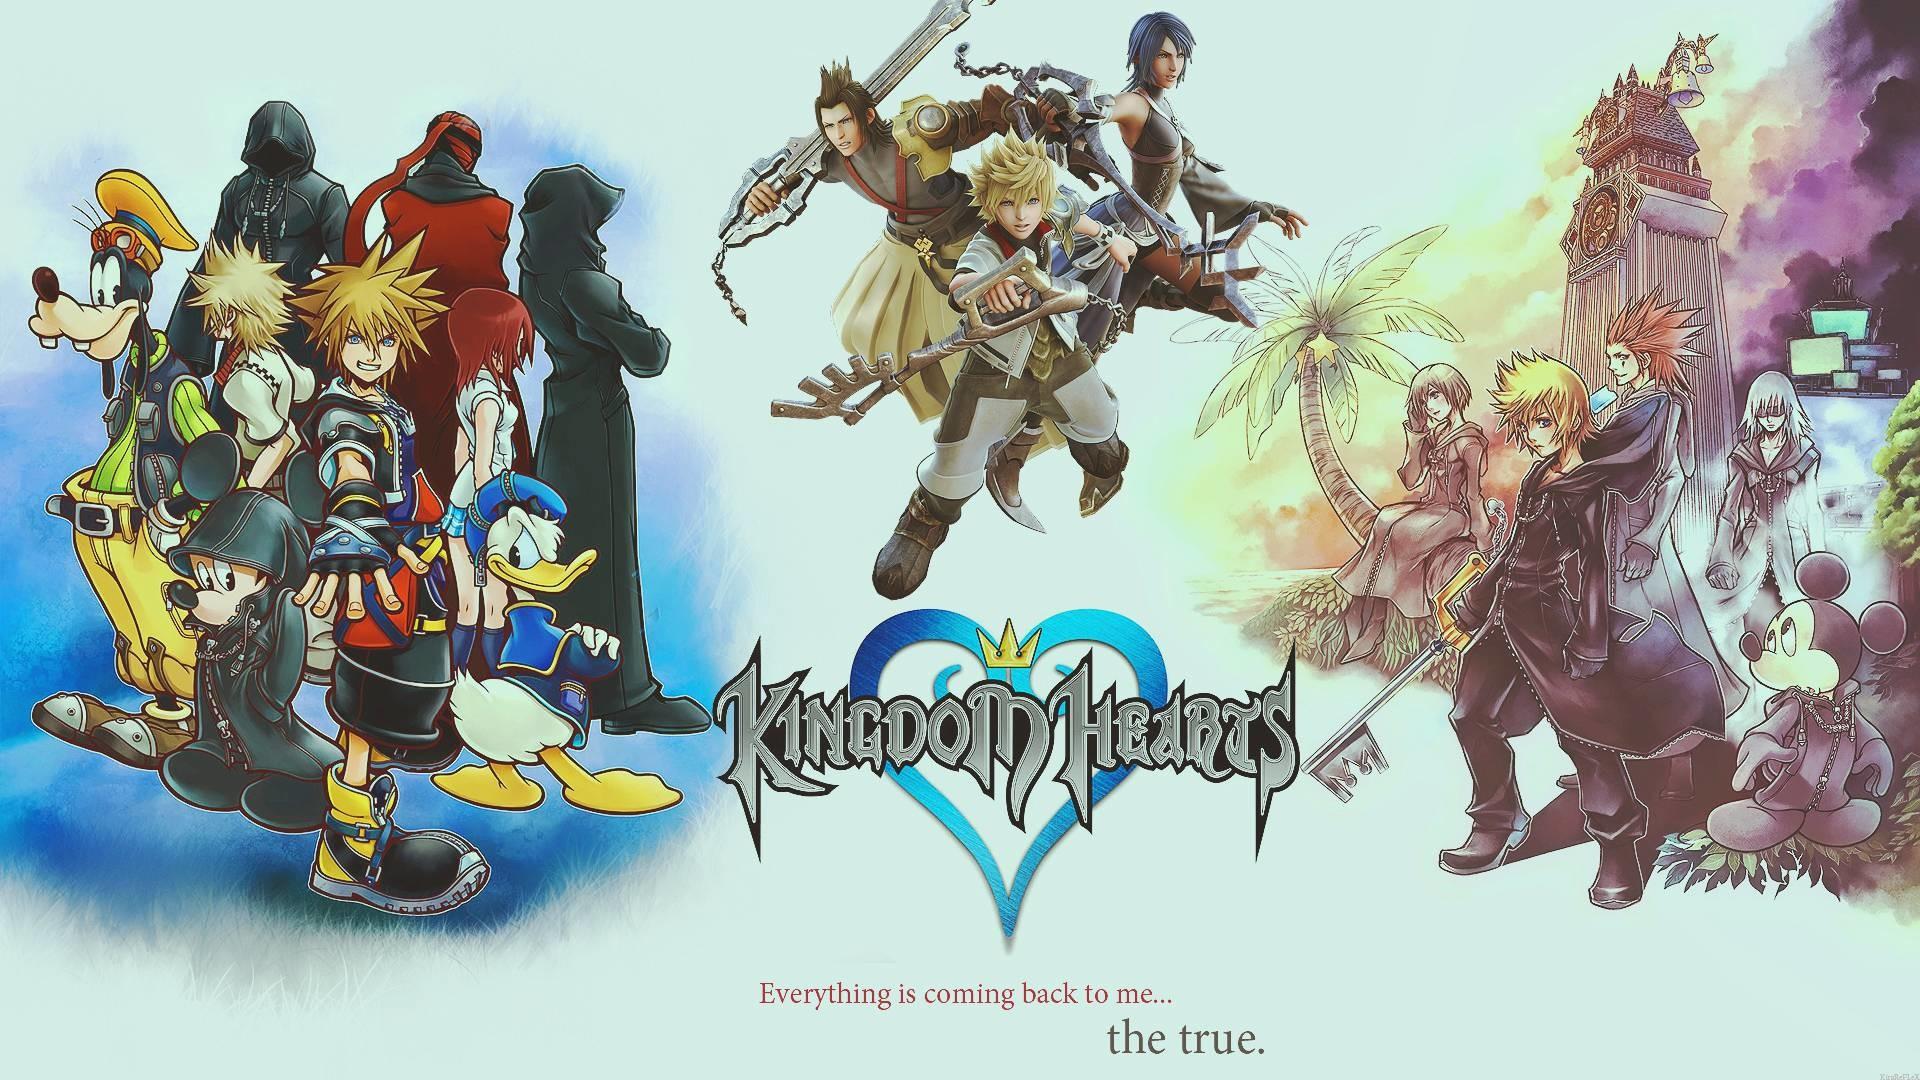 Kingdom Hearts Wallpaper Hd #732 Wallpaper   Update Wallpaper